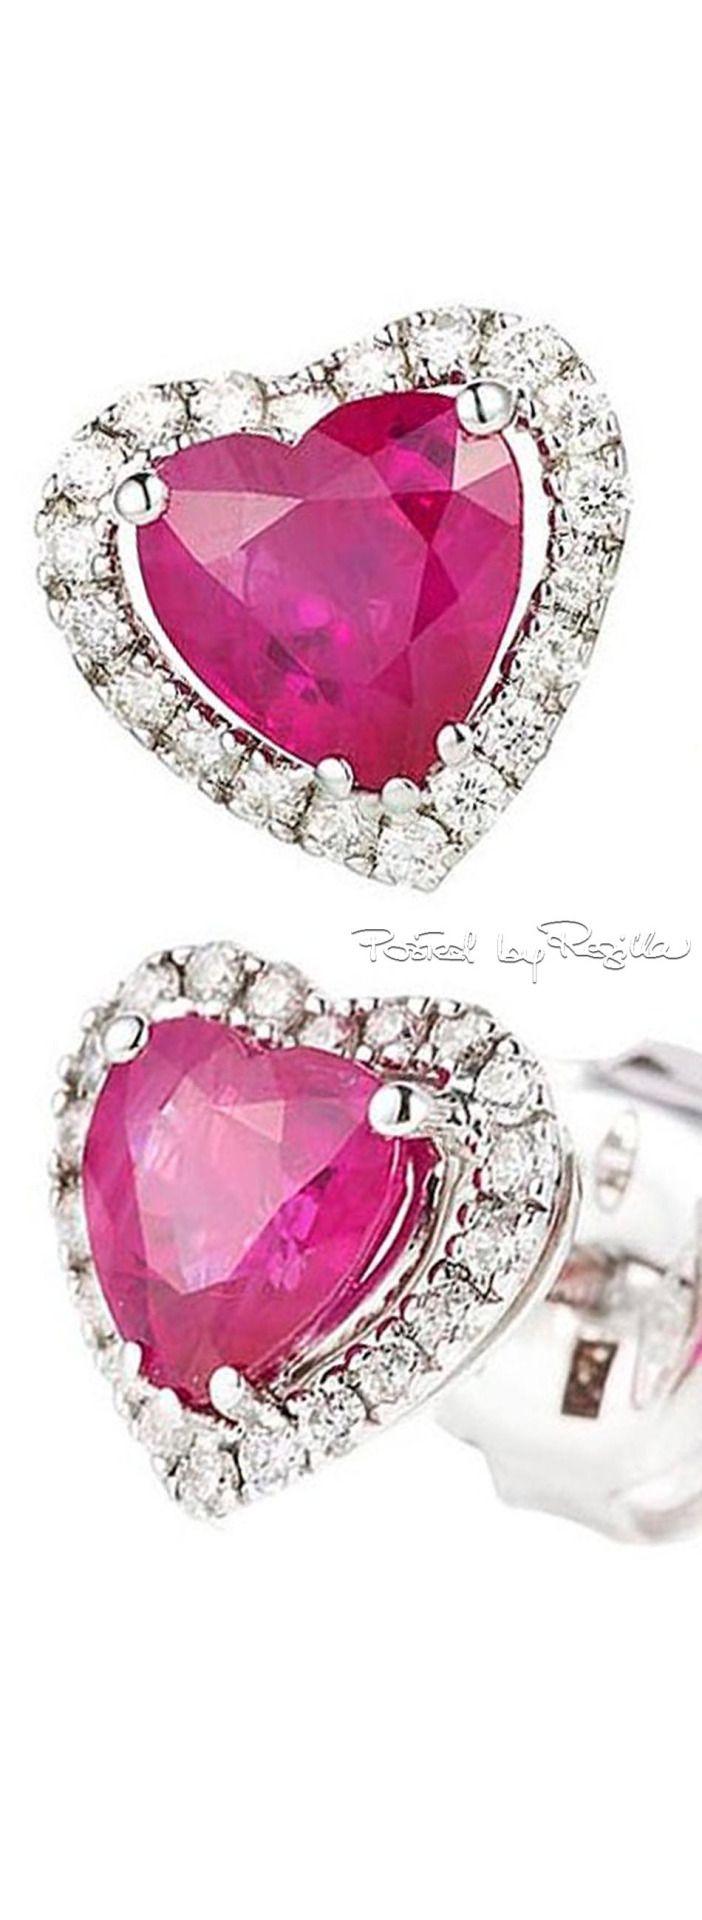 483 best Bijoux images on Pinterest | Gemstones, Charm bracelets and ...